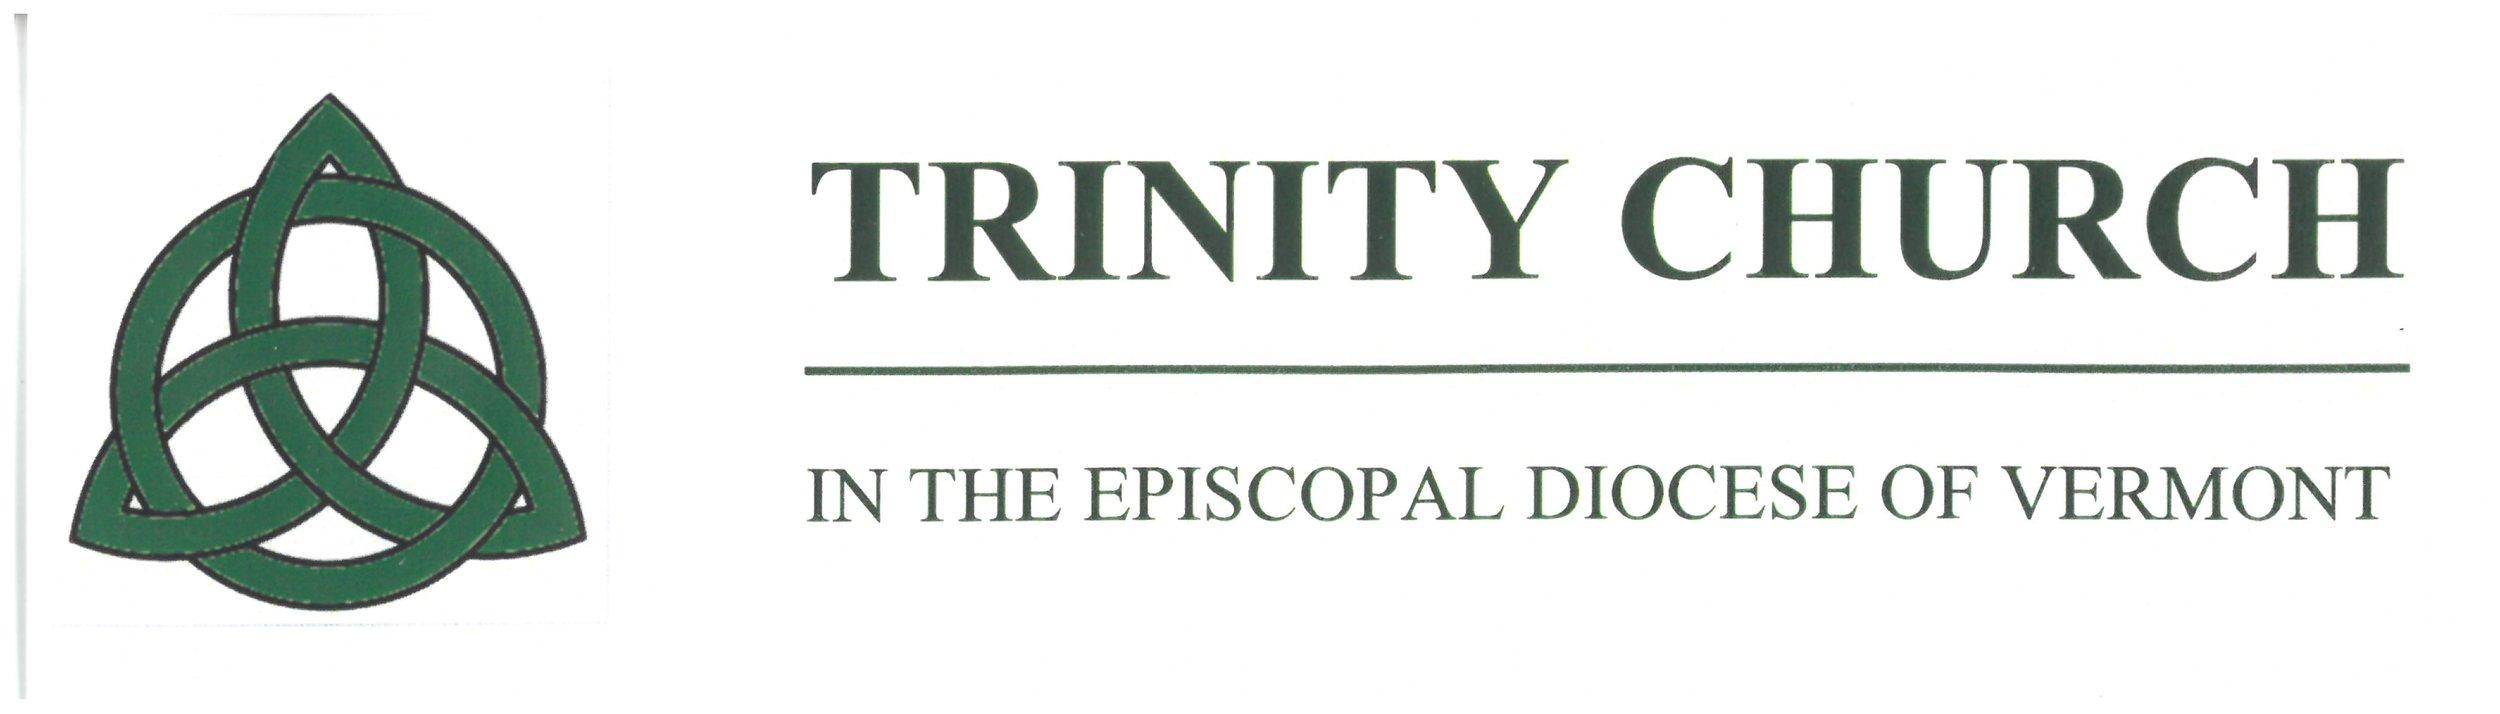 Trinity_logo.jpg